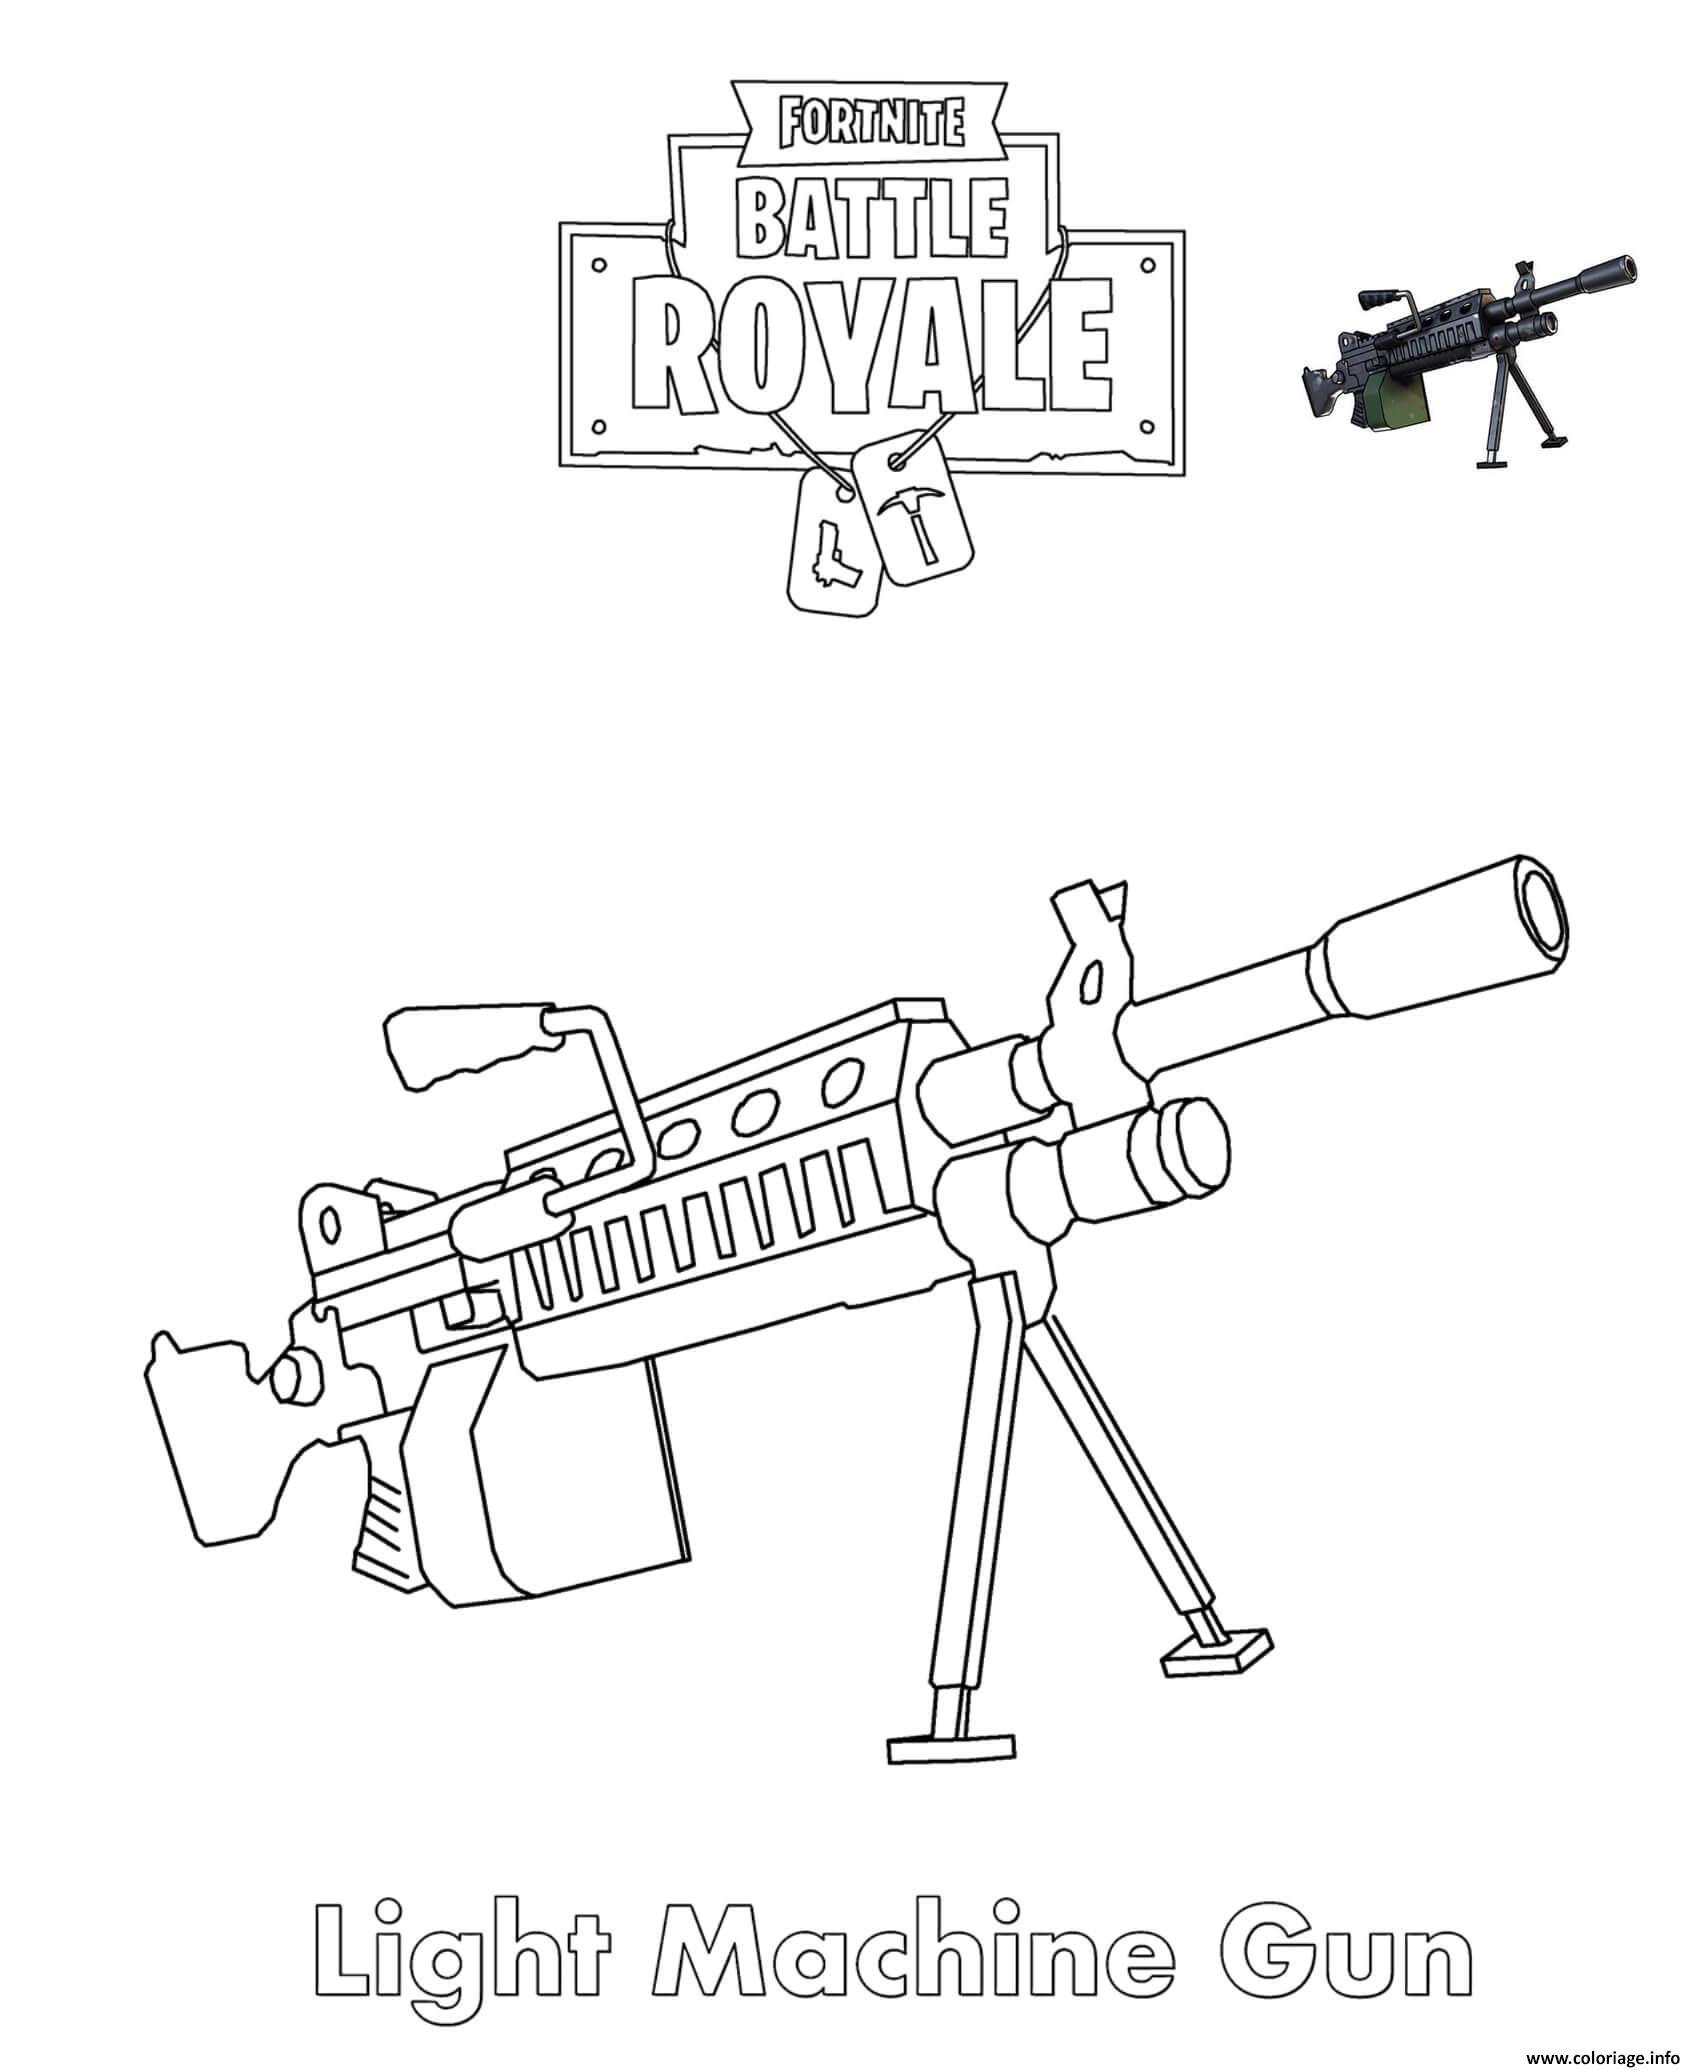 Coloriage Light Machine Gun Fortnite Battle Royale Dessin